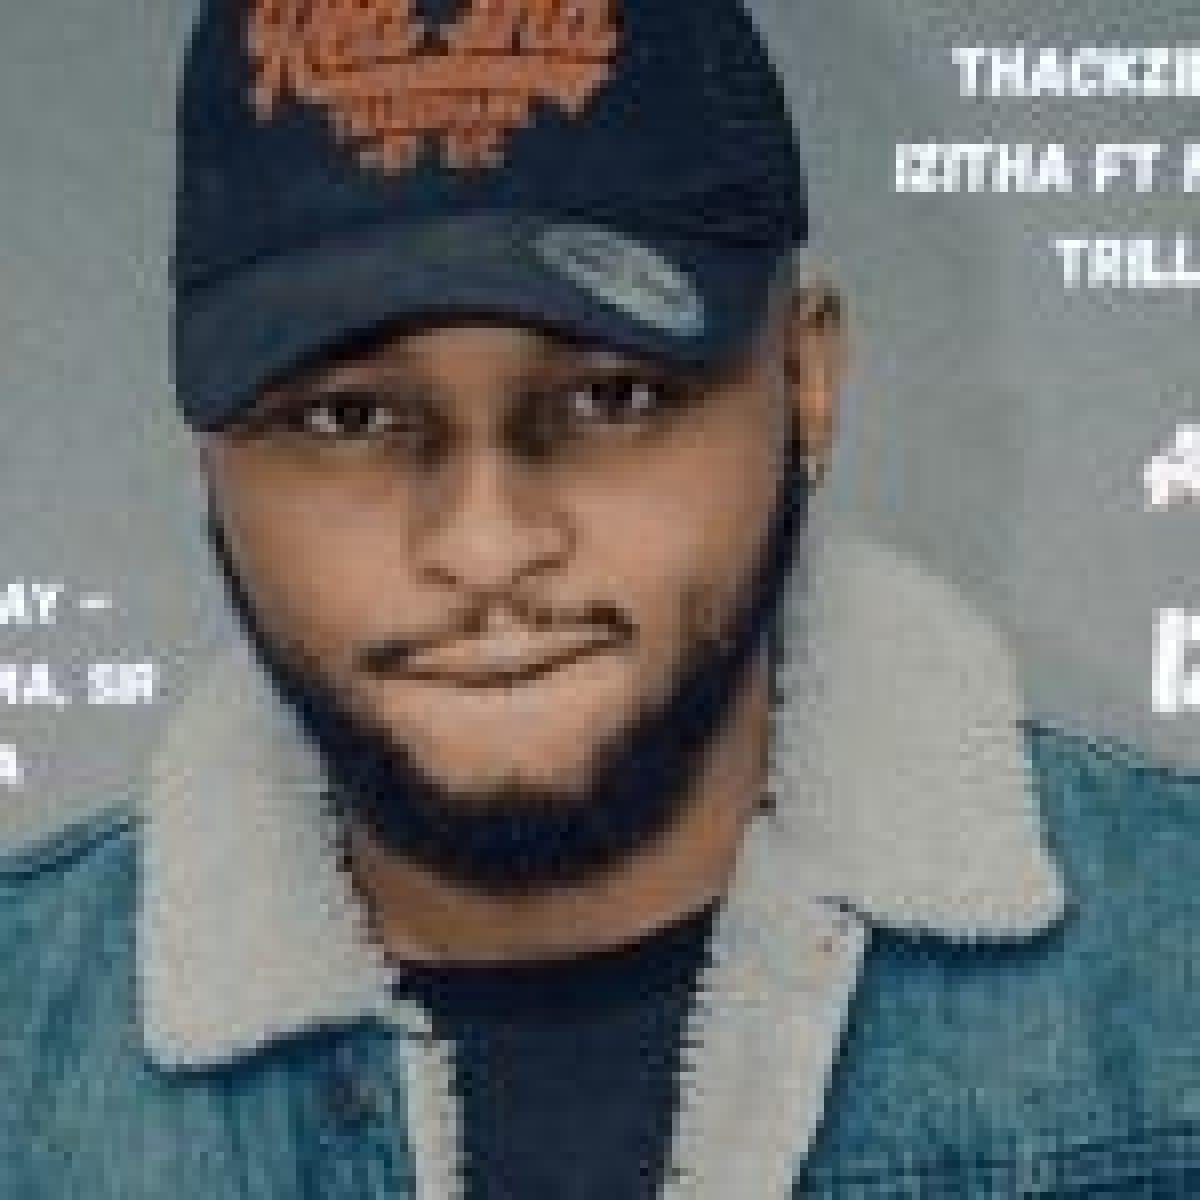 ThackzinDj & TeeJay – Izitha Ft. Nkosazana, Sir Trill & Mpura